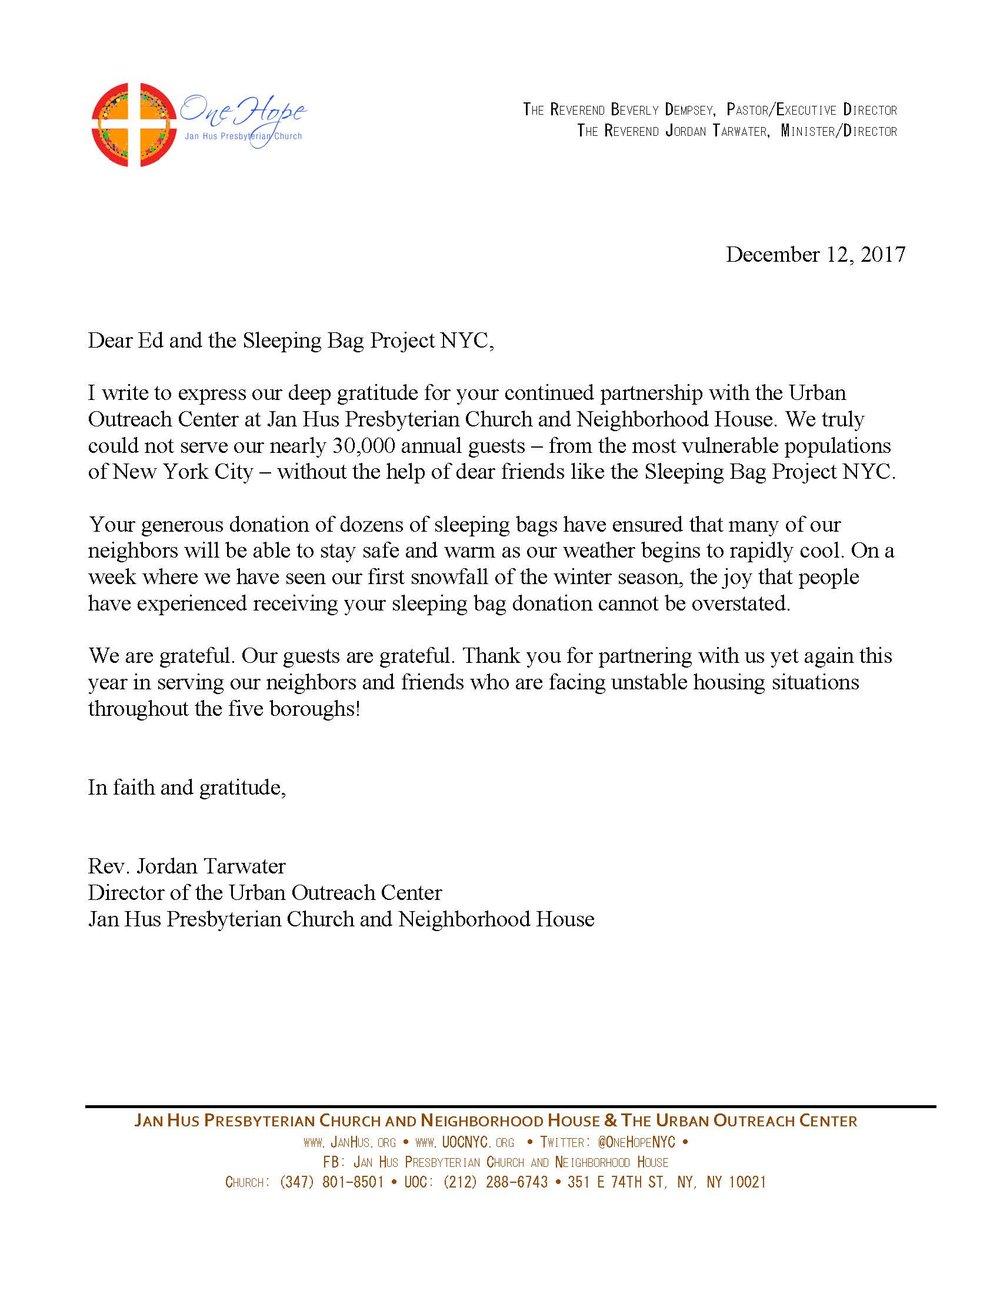 thank you letter Jan Hus Presbyterian Church.jpg